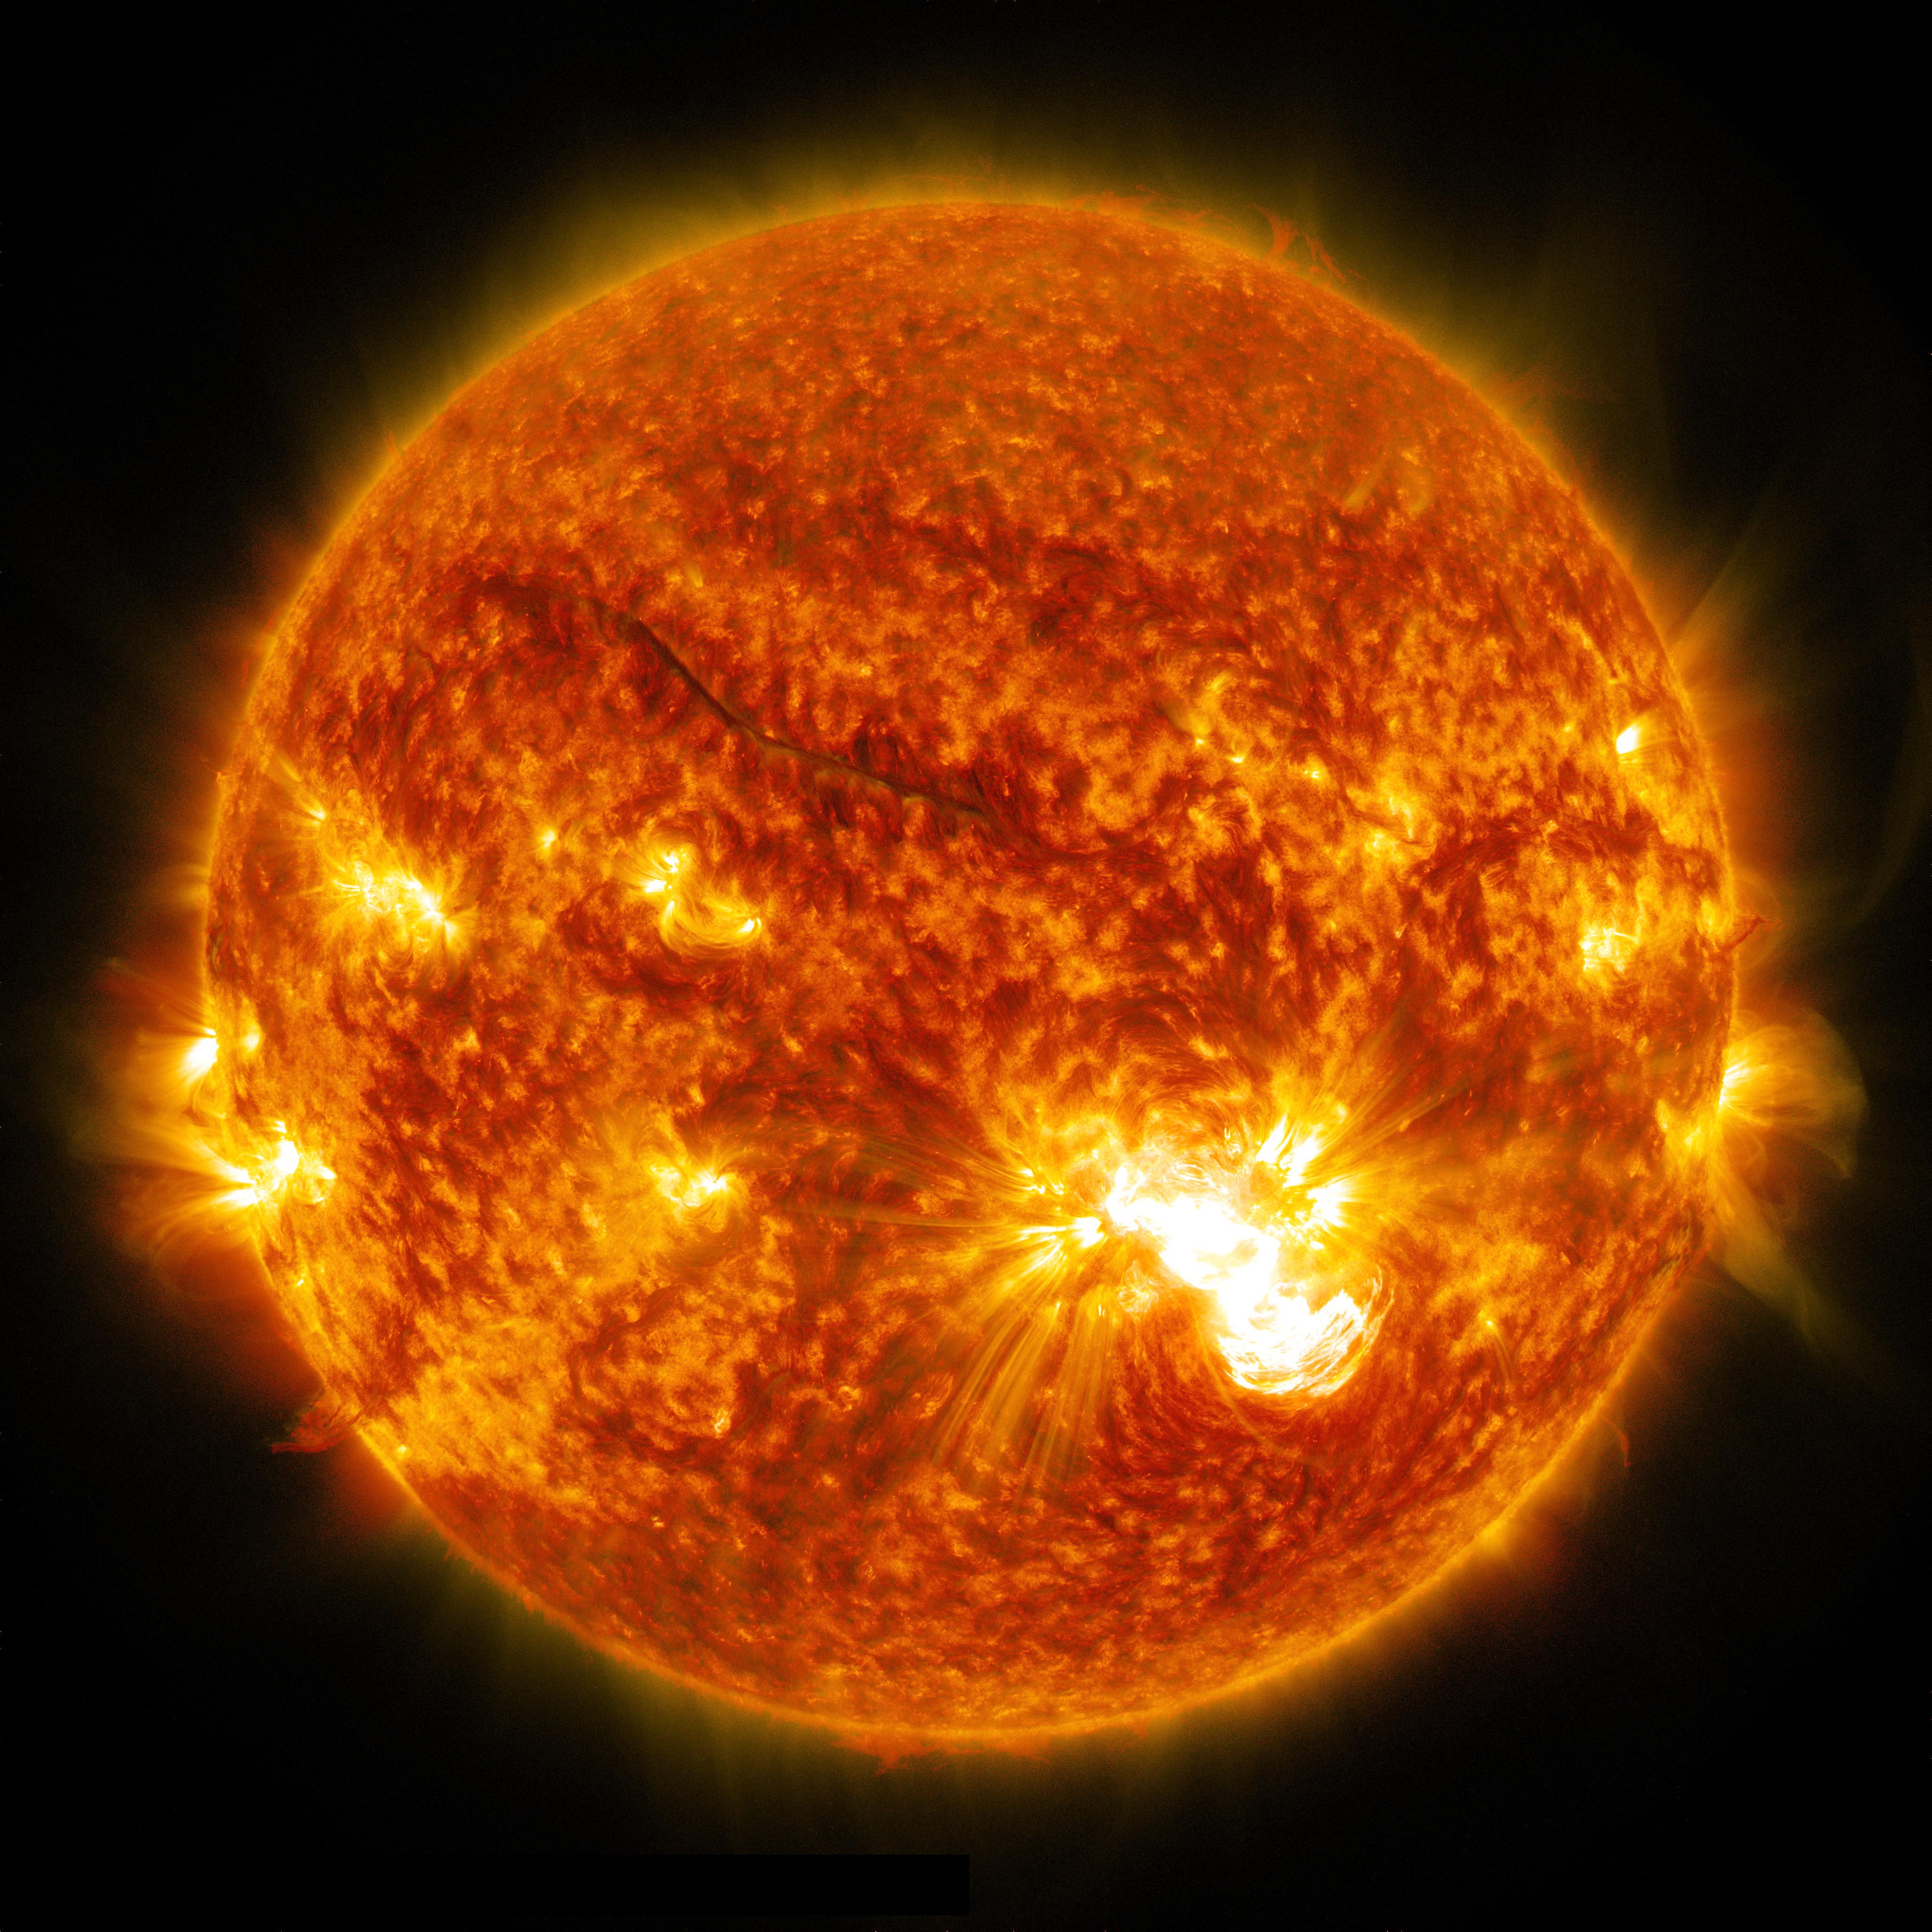 sun release x3 1 class solar flare on oct 24 2014 nasa